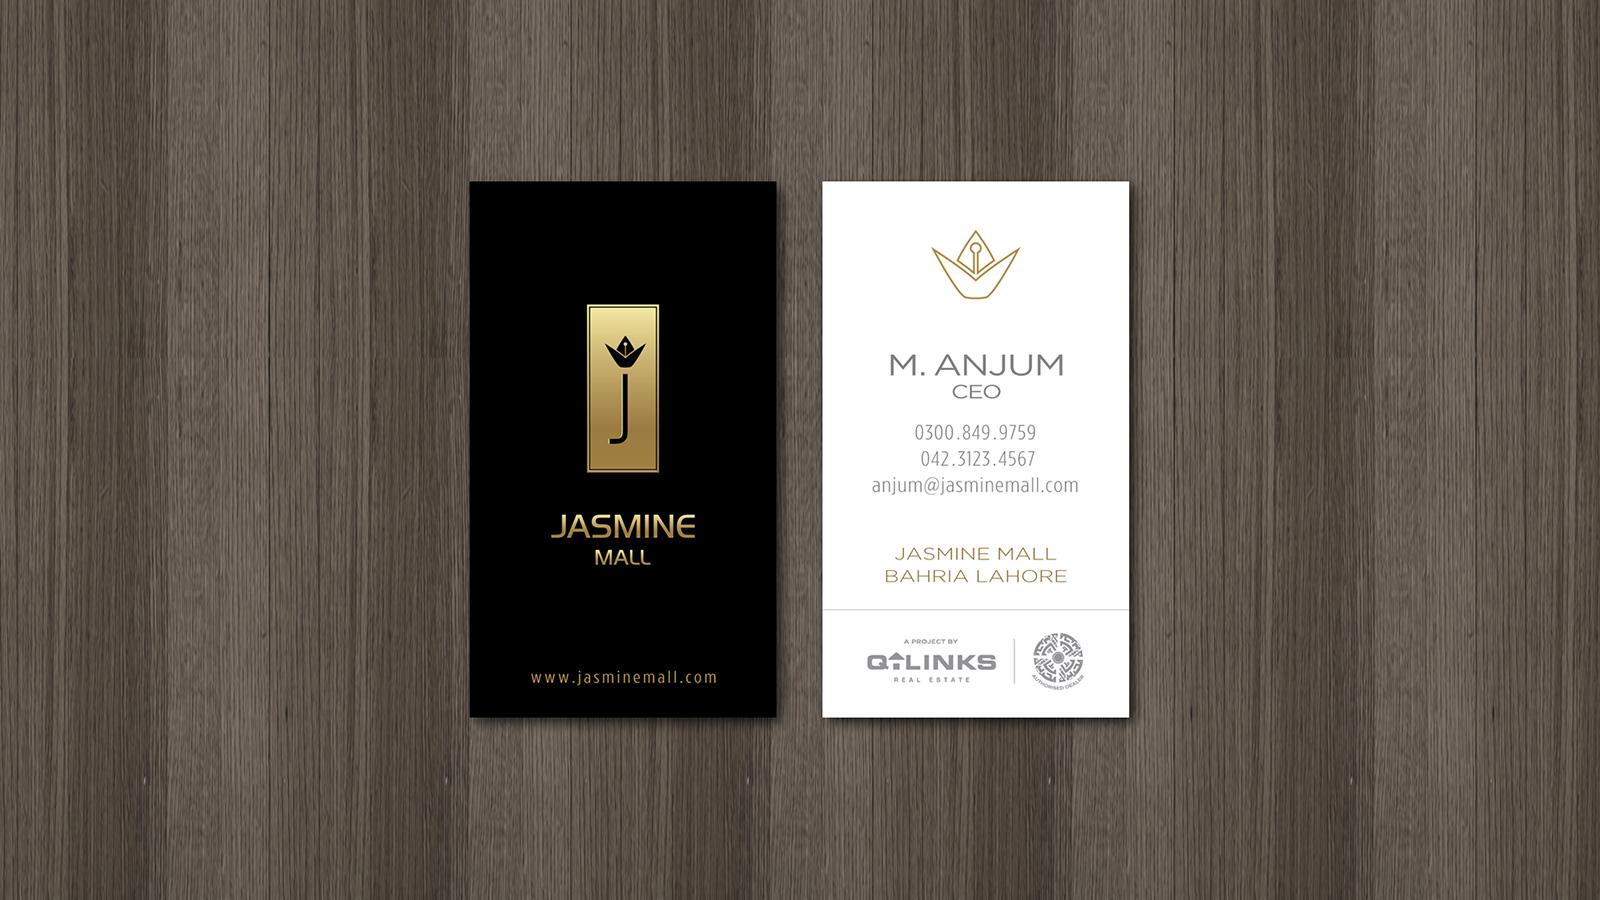 graphic-brand-design-web-designer-hiline-lahore-pakistan-jasmine-mall-005